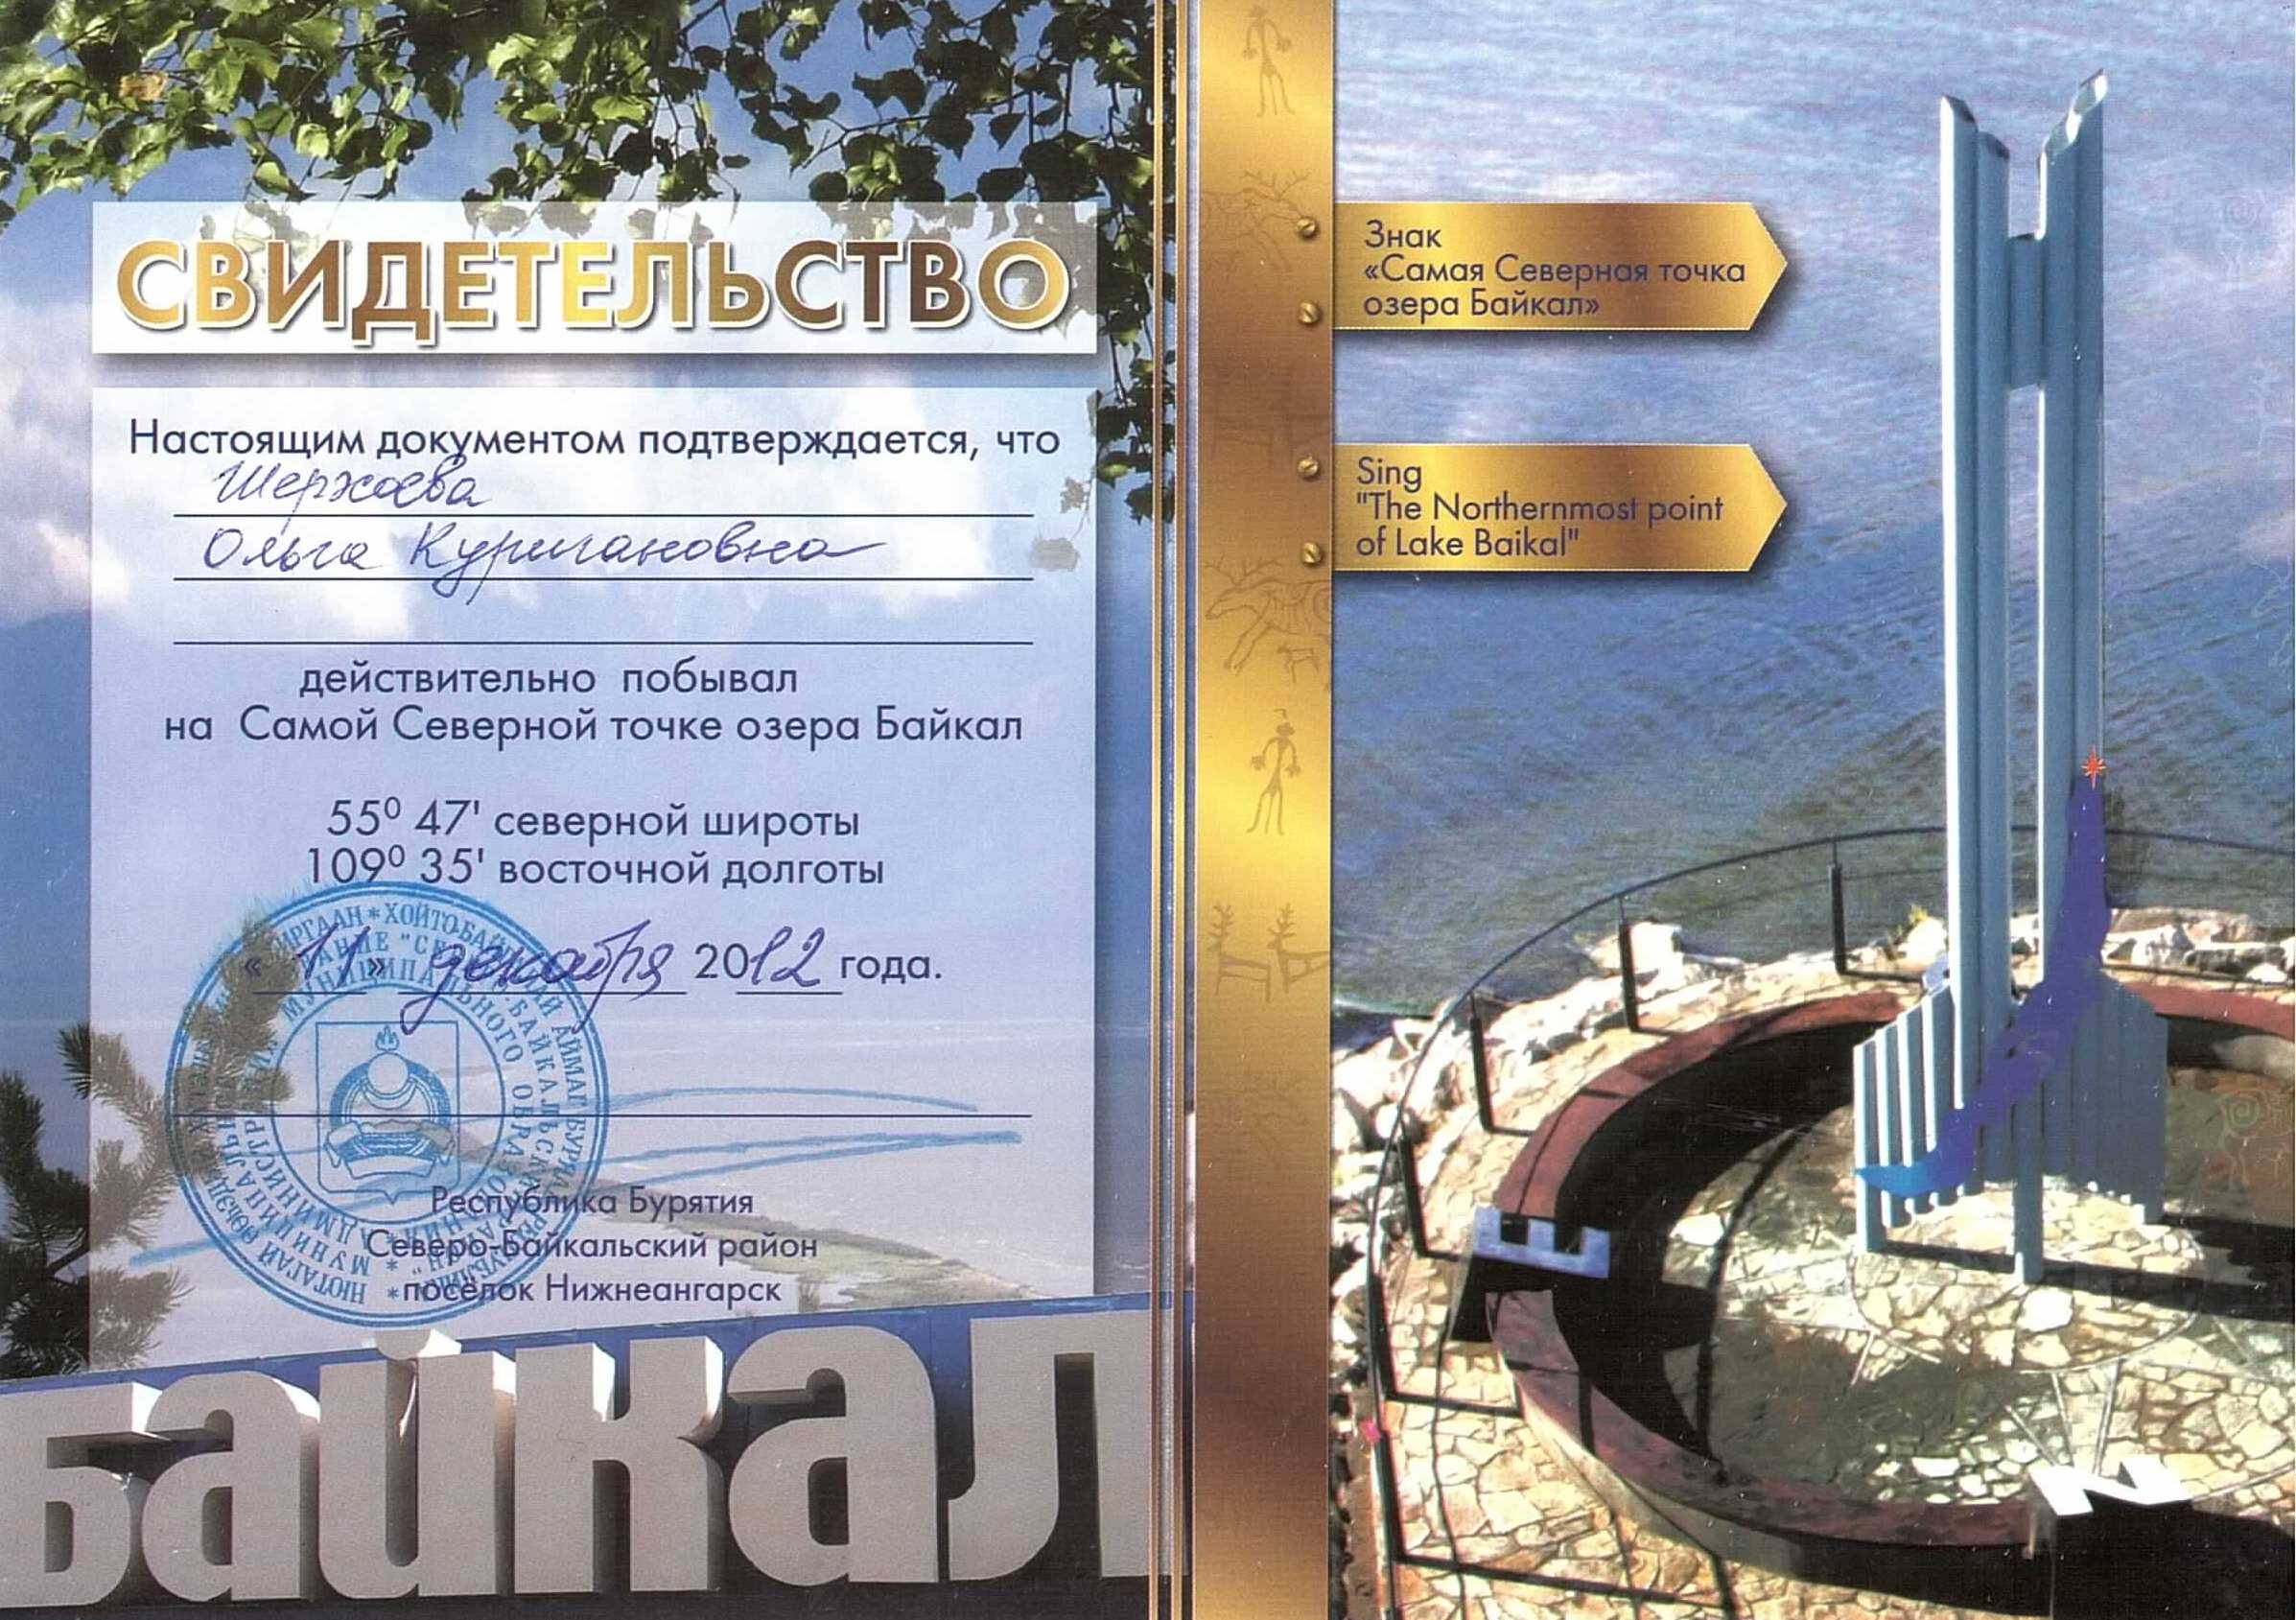 Sertificate. North Baikal Point.